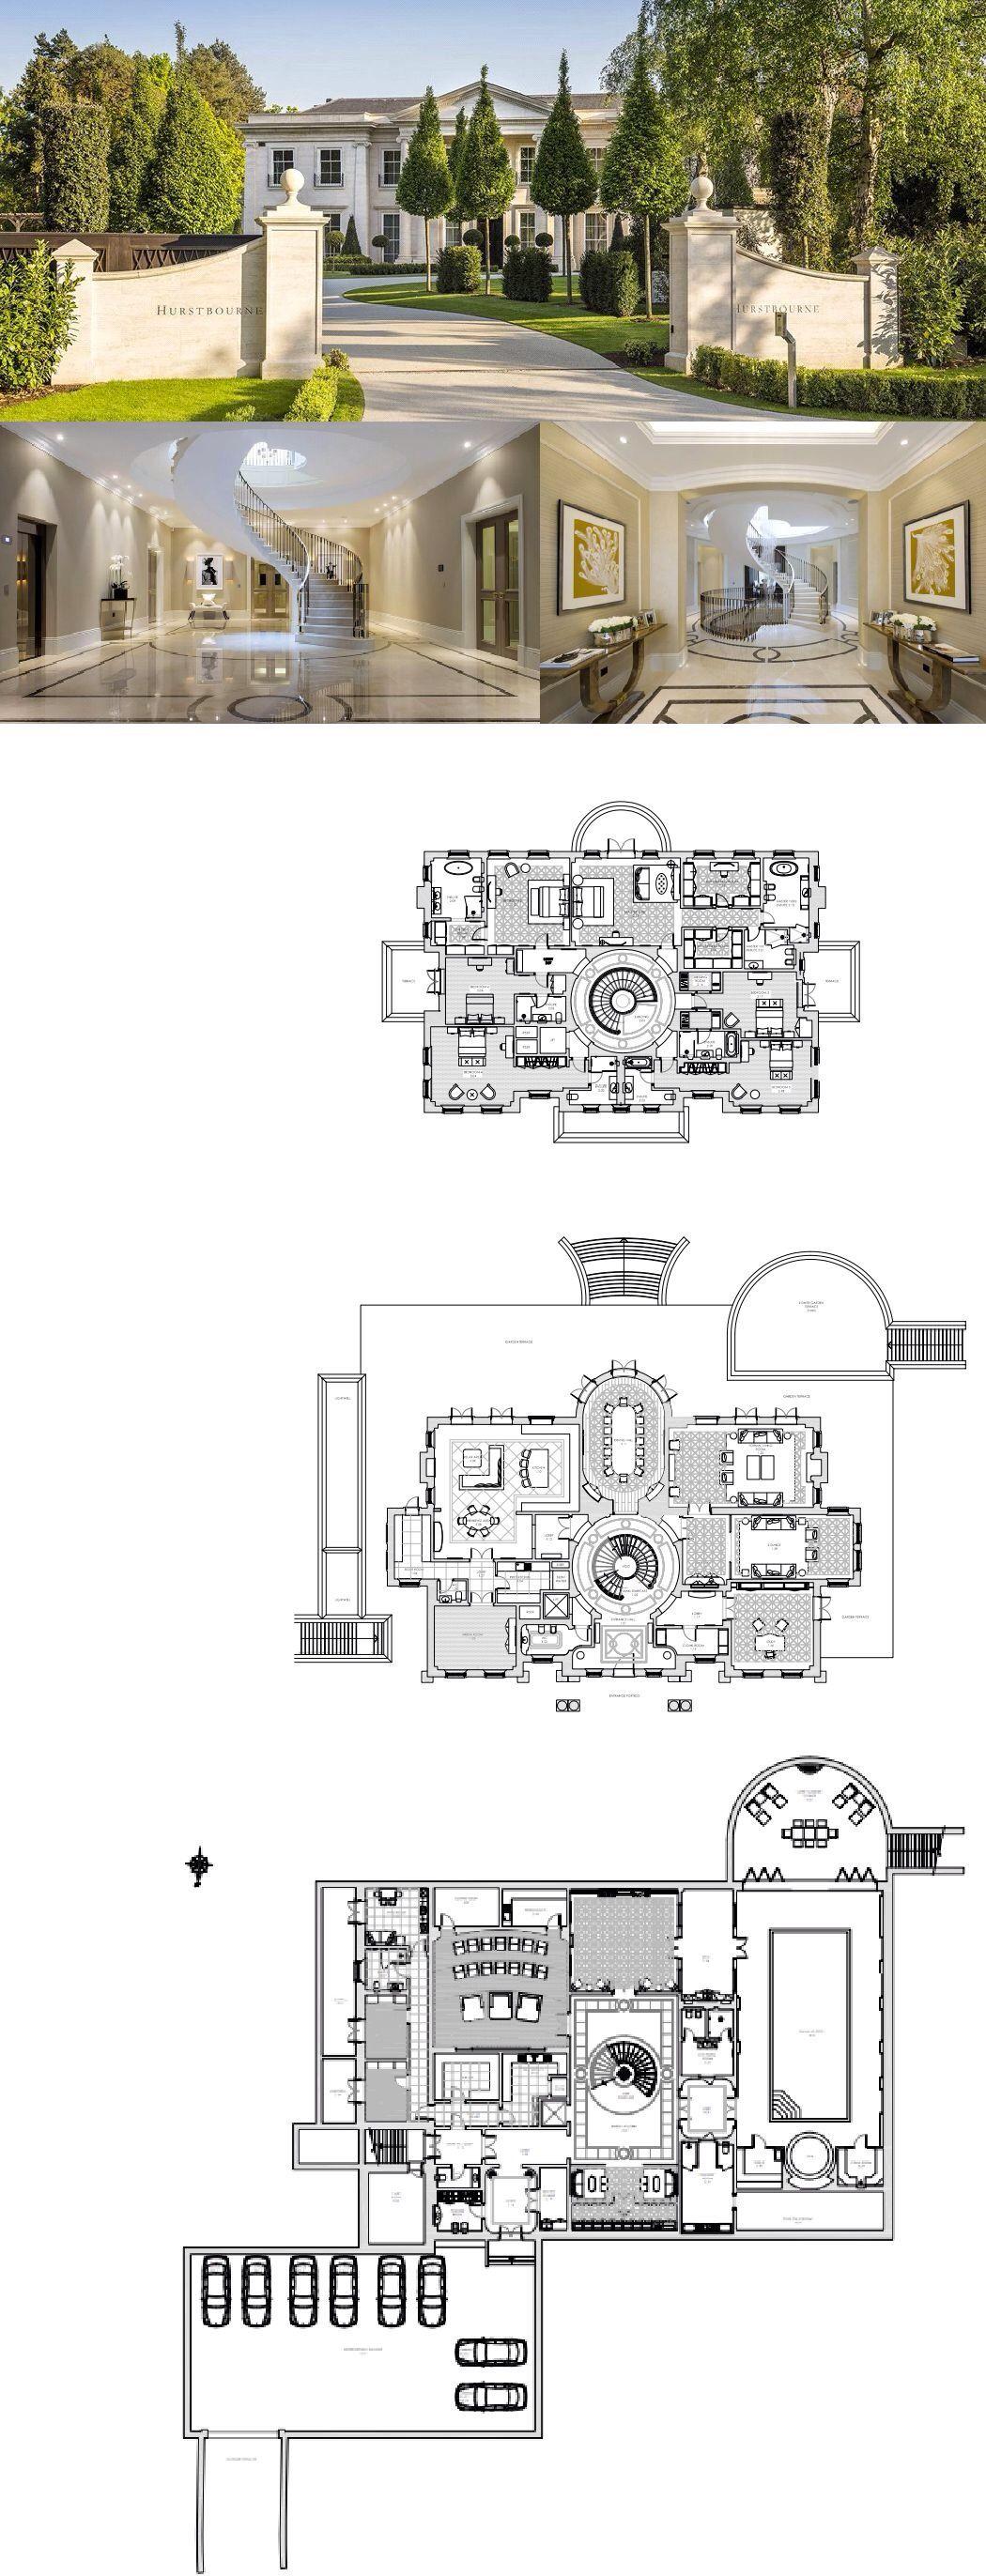 Florida House Plan chp 53040 Bedrooms